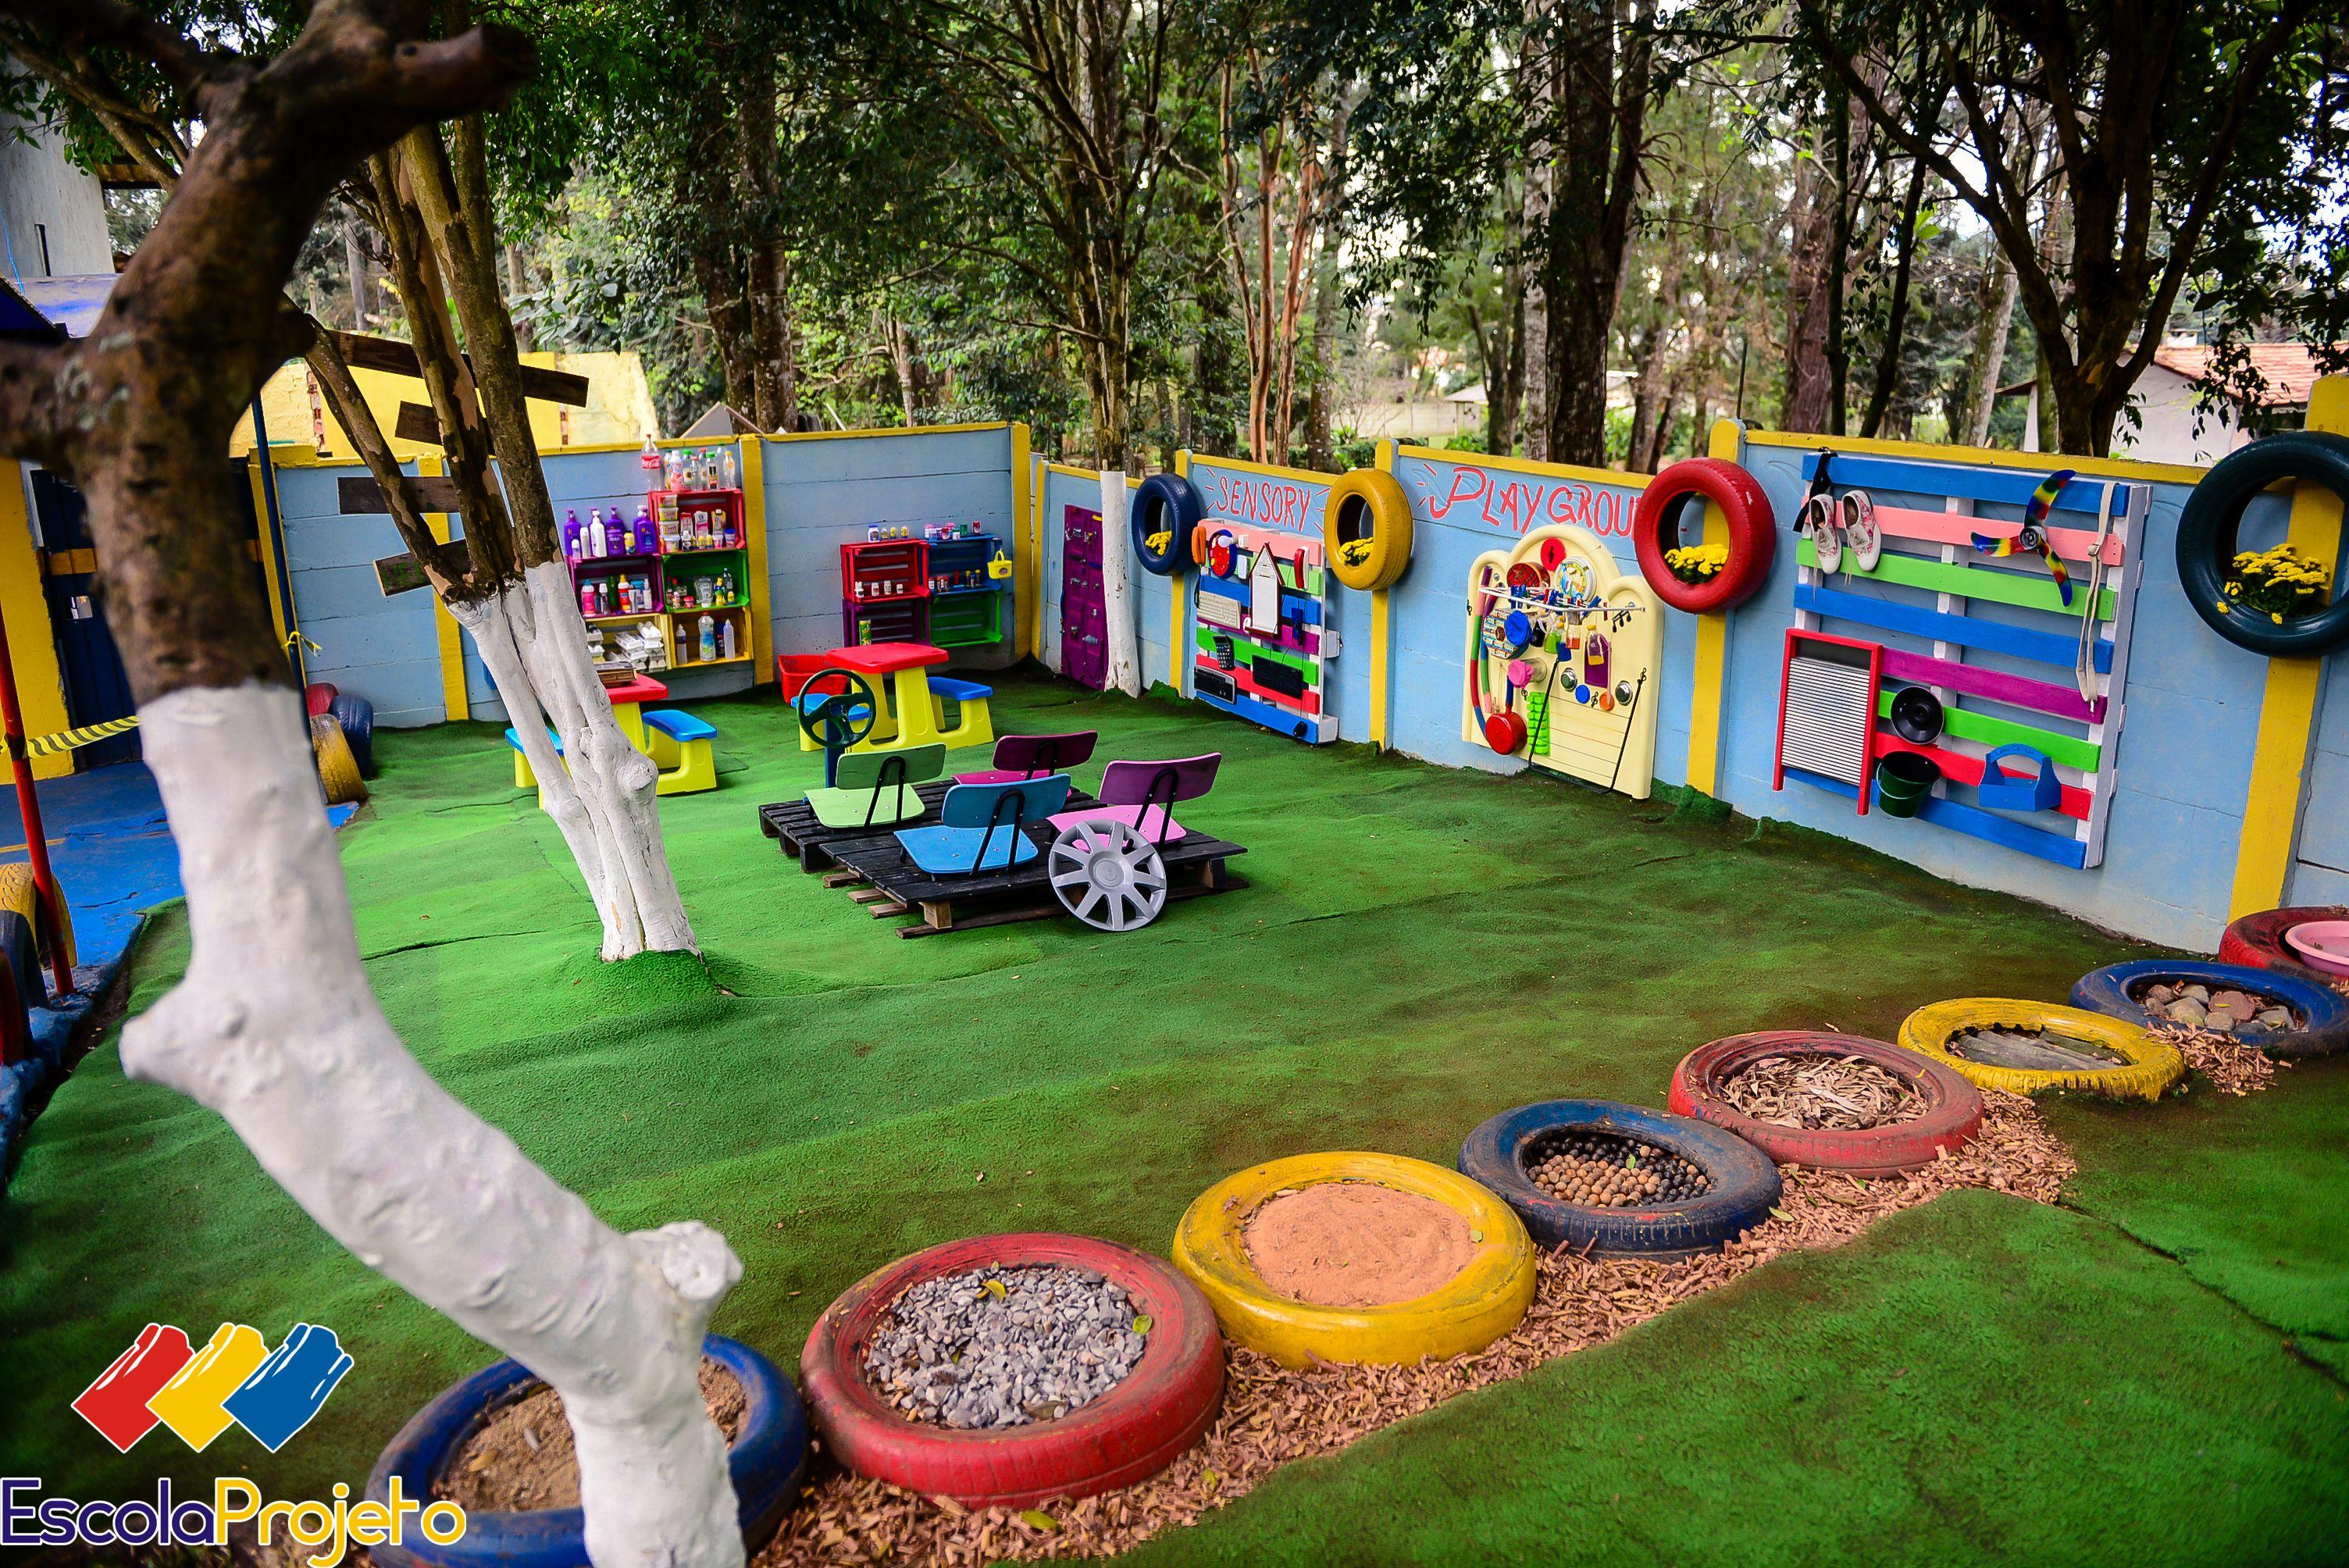 Parque Sensorial Sensory Playground Escola Projeto Lápis De Cor Curitiba Brasil Patio De Niños Recreo Al Aire Libre Para Niños Patios De Recreo